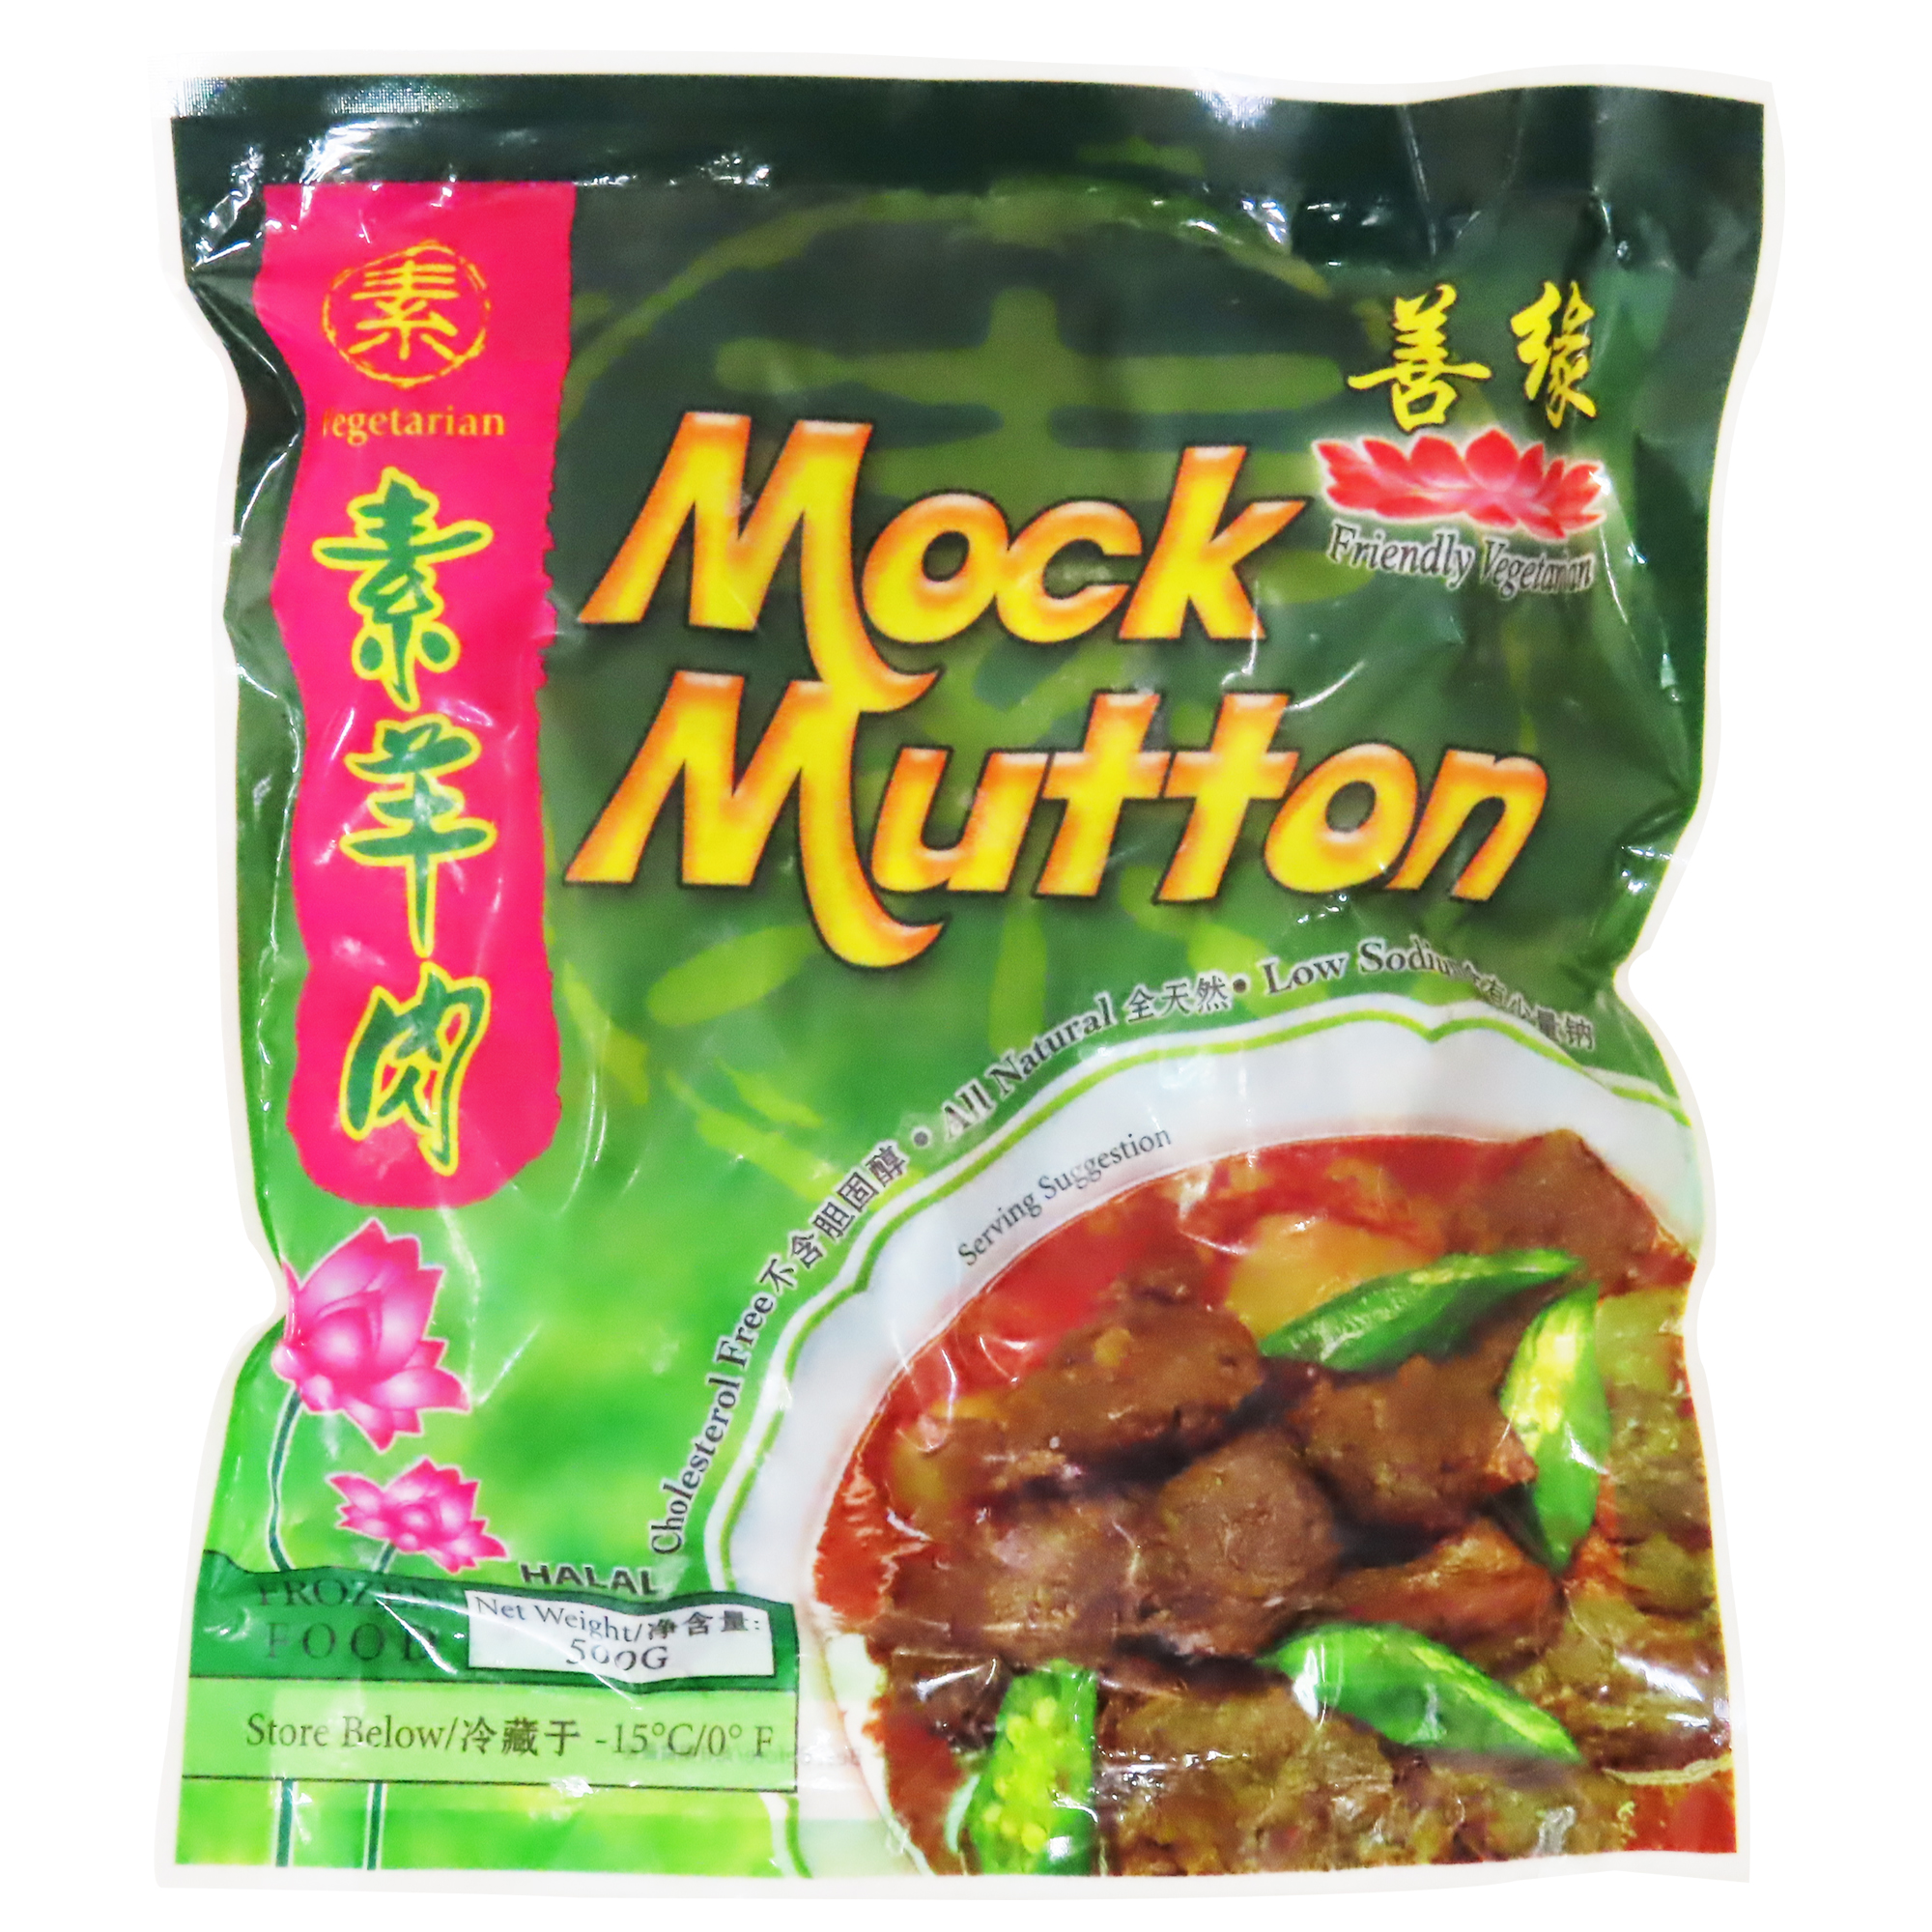 Image Mock Mutton 善缘 - 素羊肉 500grams